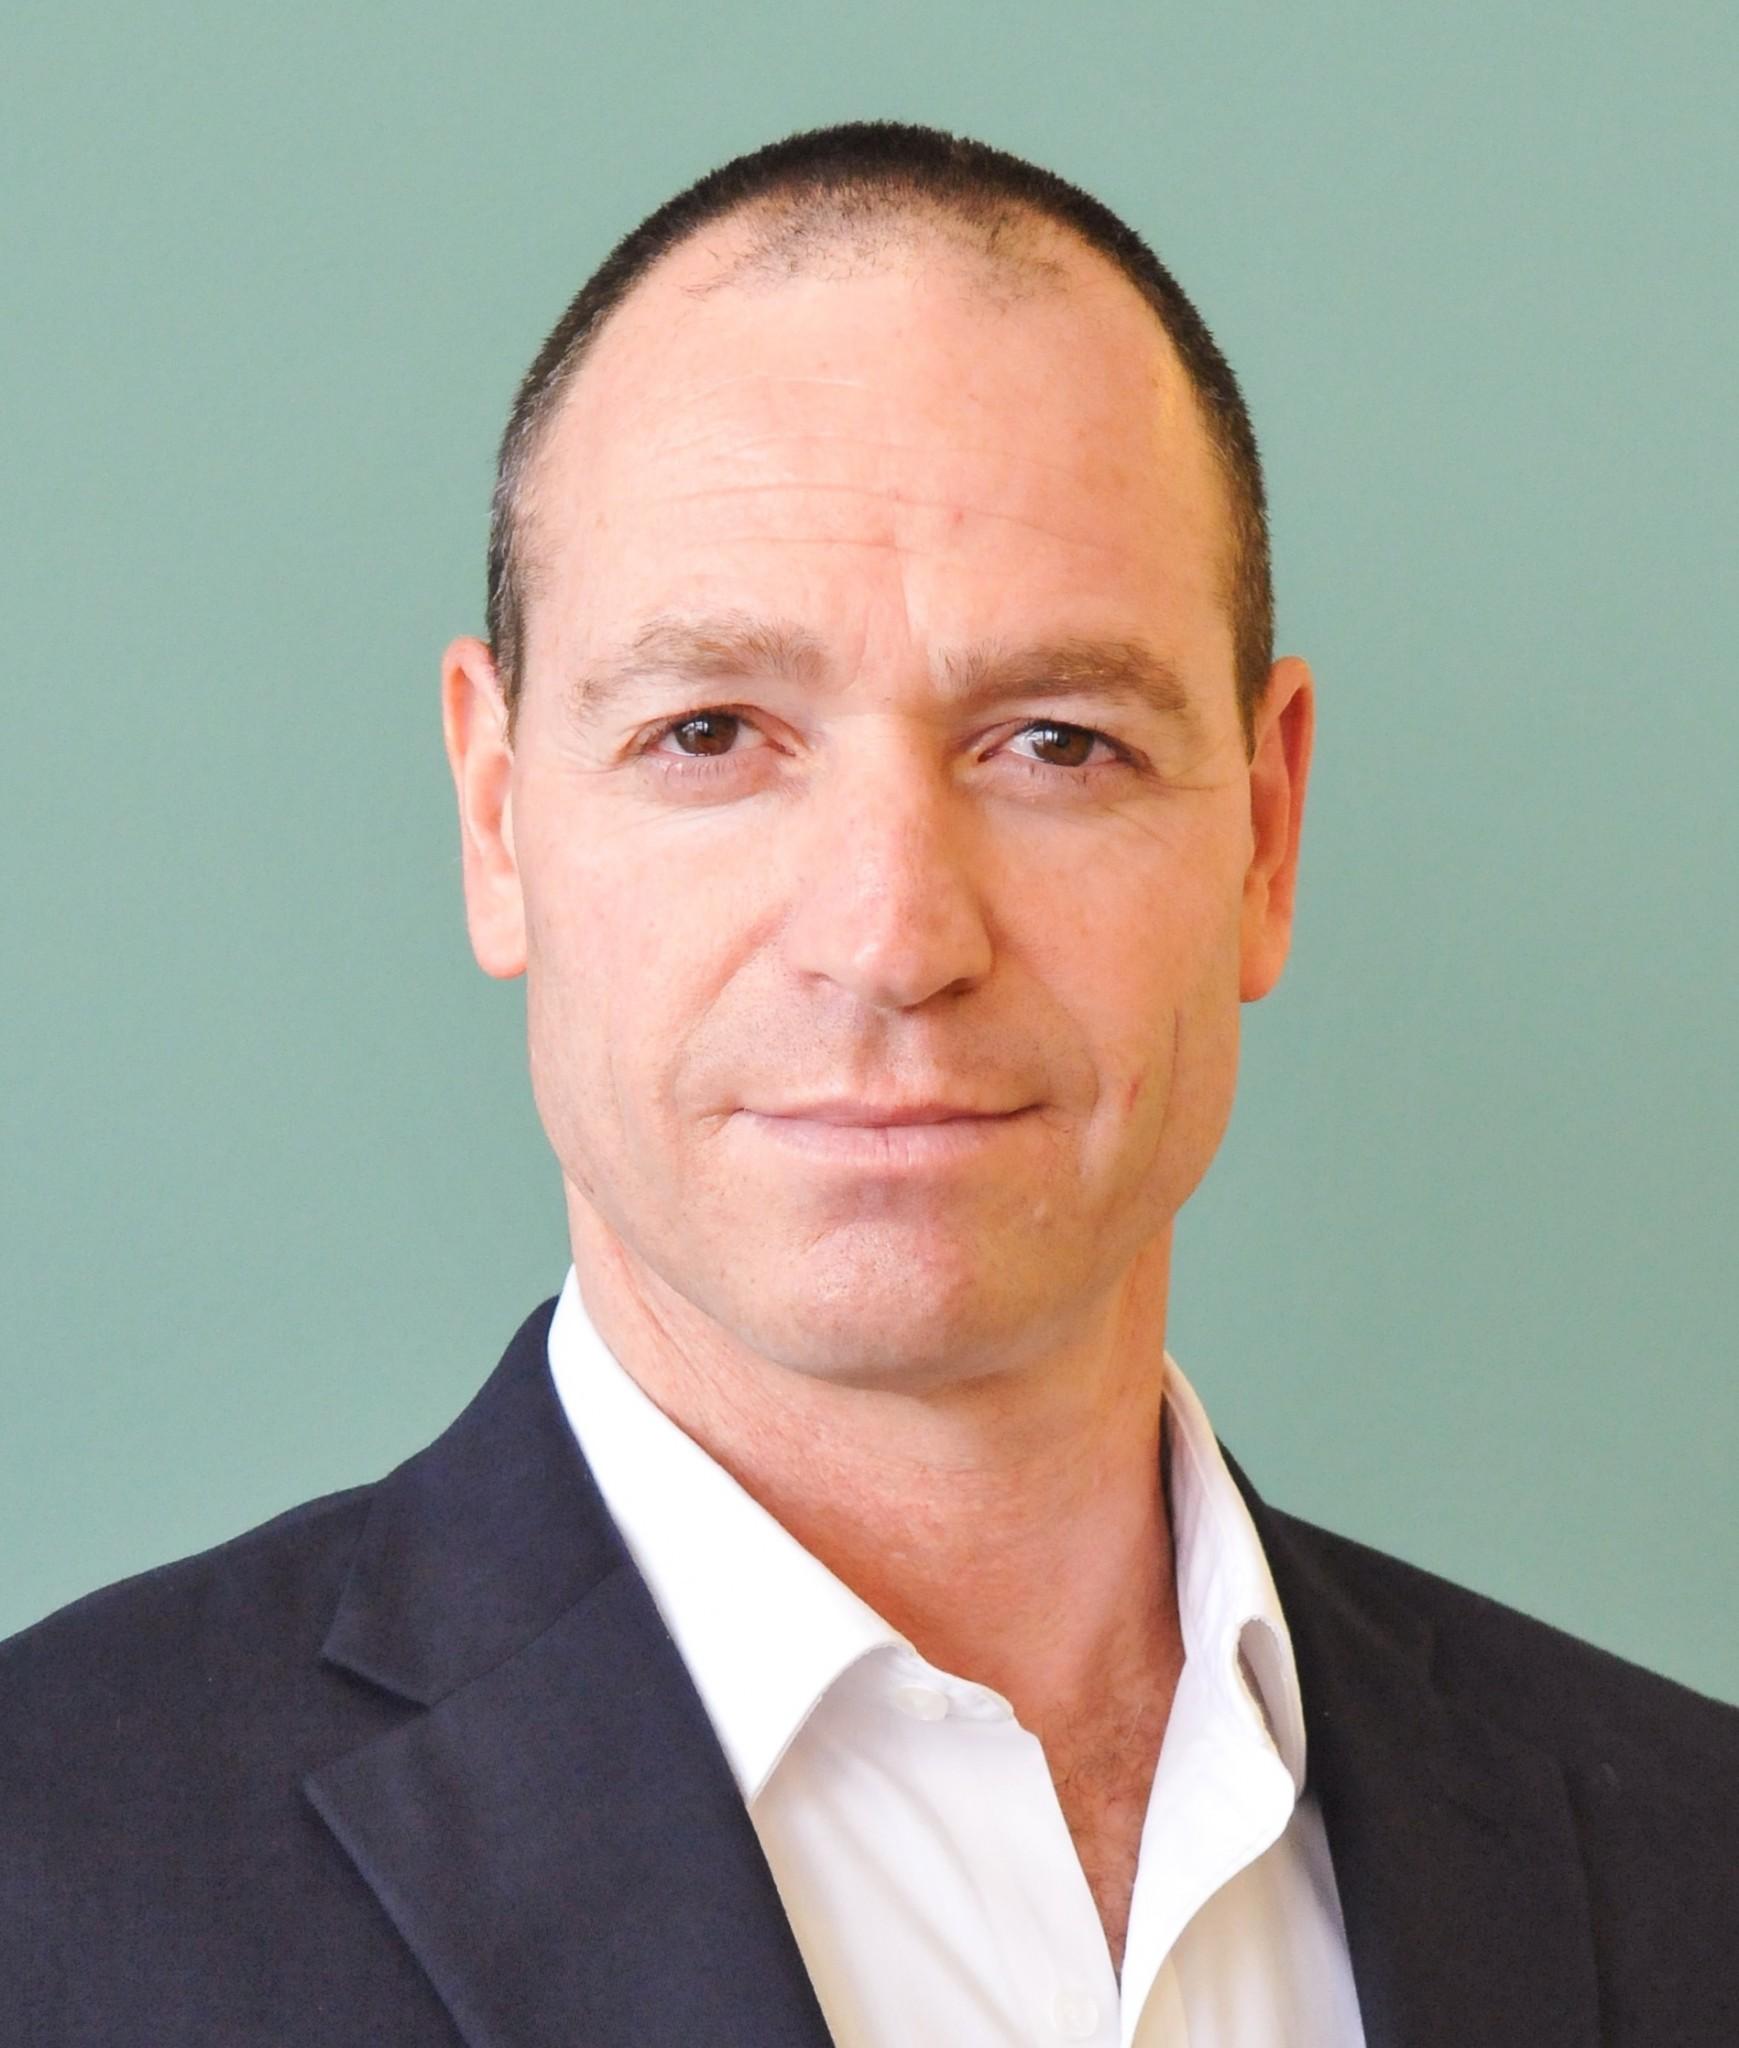 Ronen Yehoshua, Morphisec's CEO